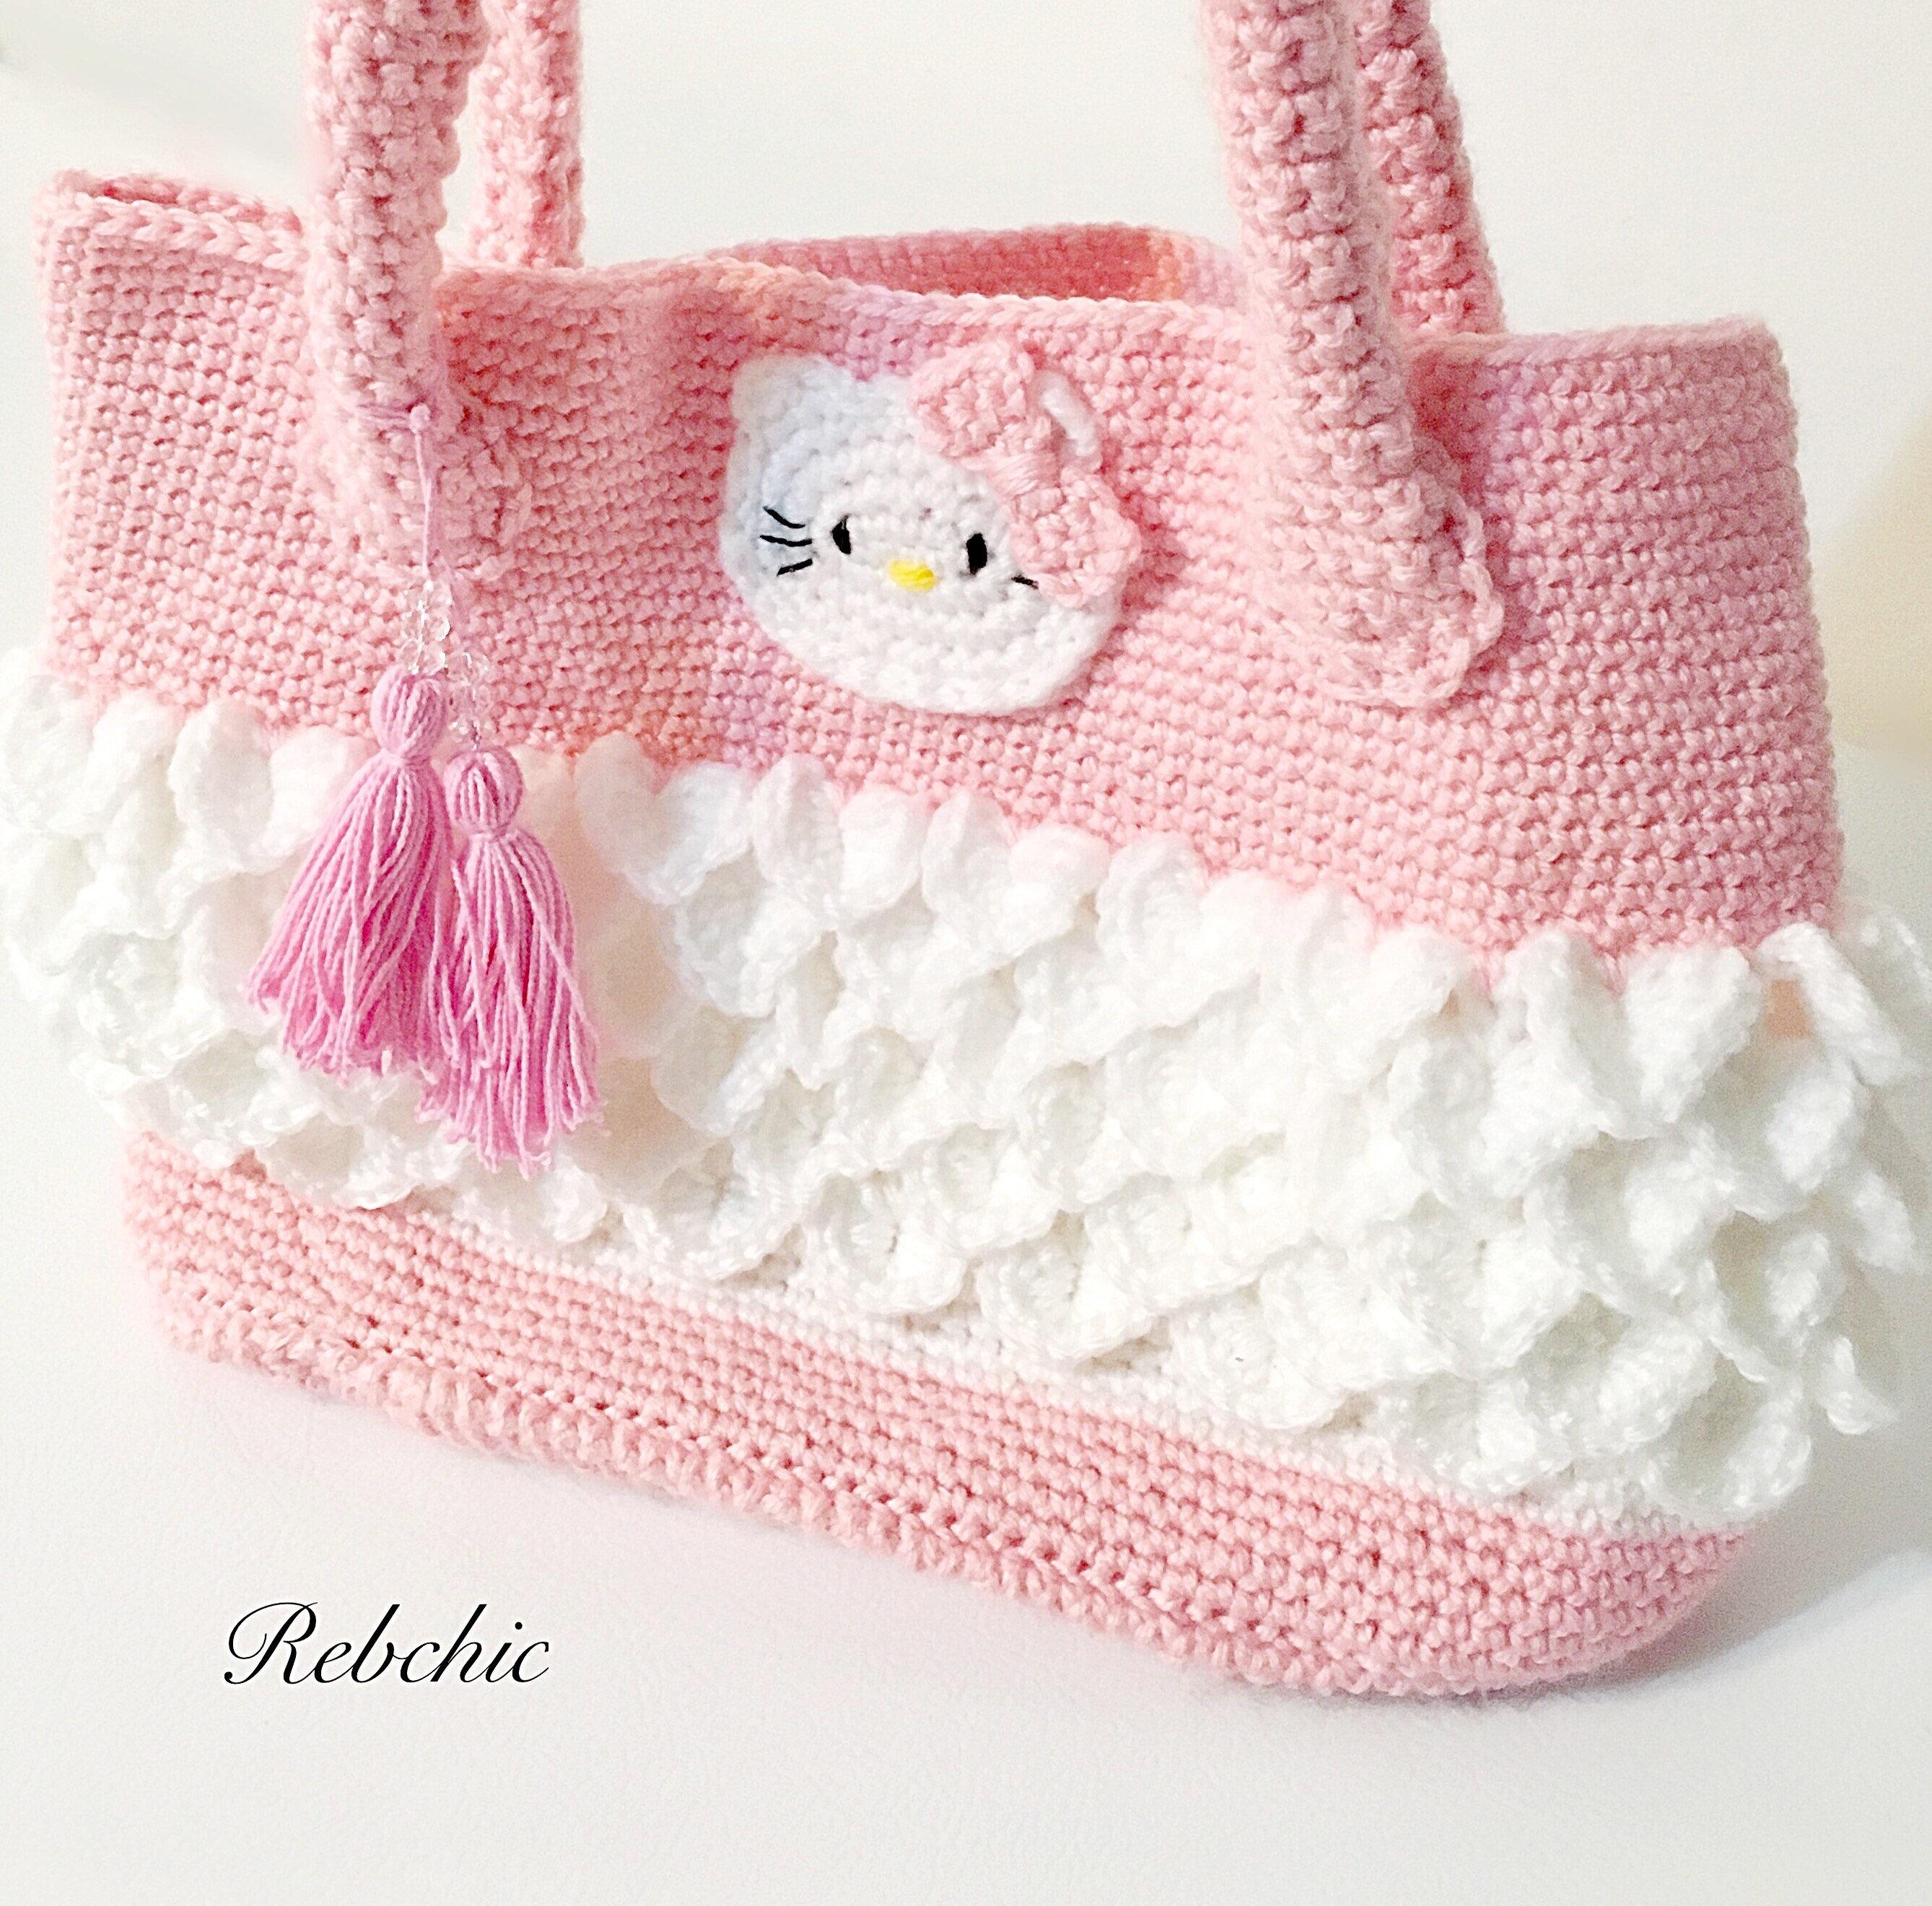 Crochet Bag Style Hello Kitty Purse Tote Bag Etsy